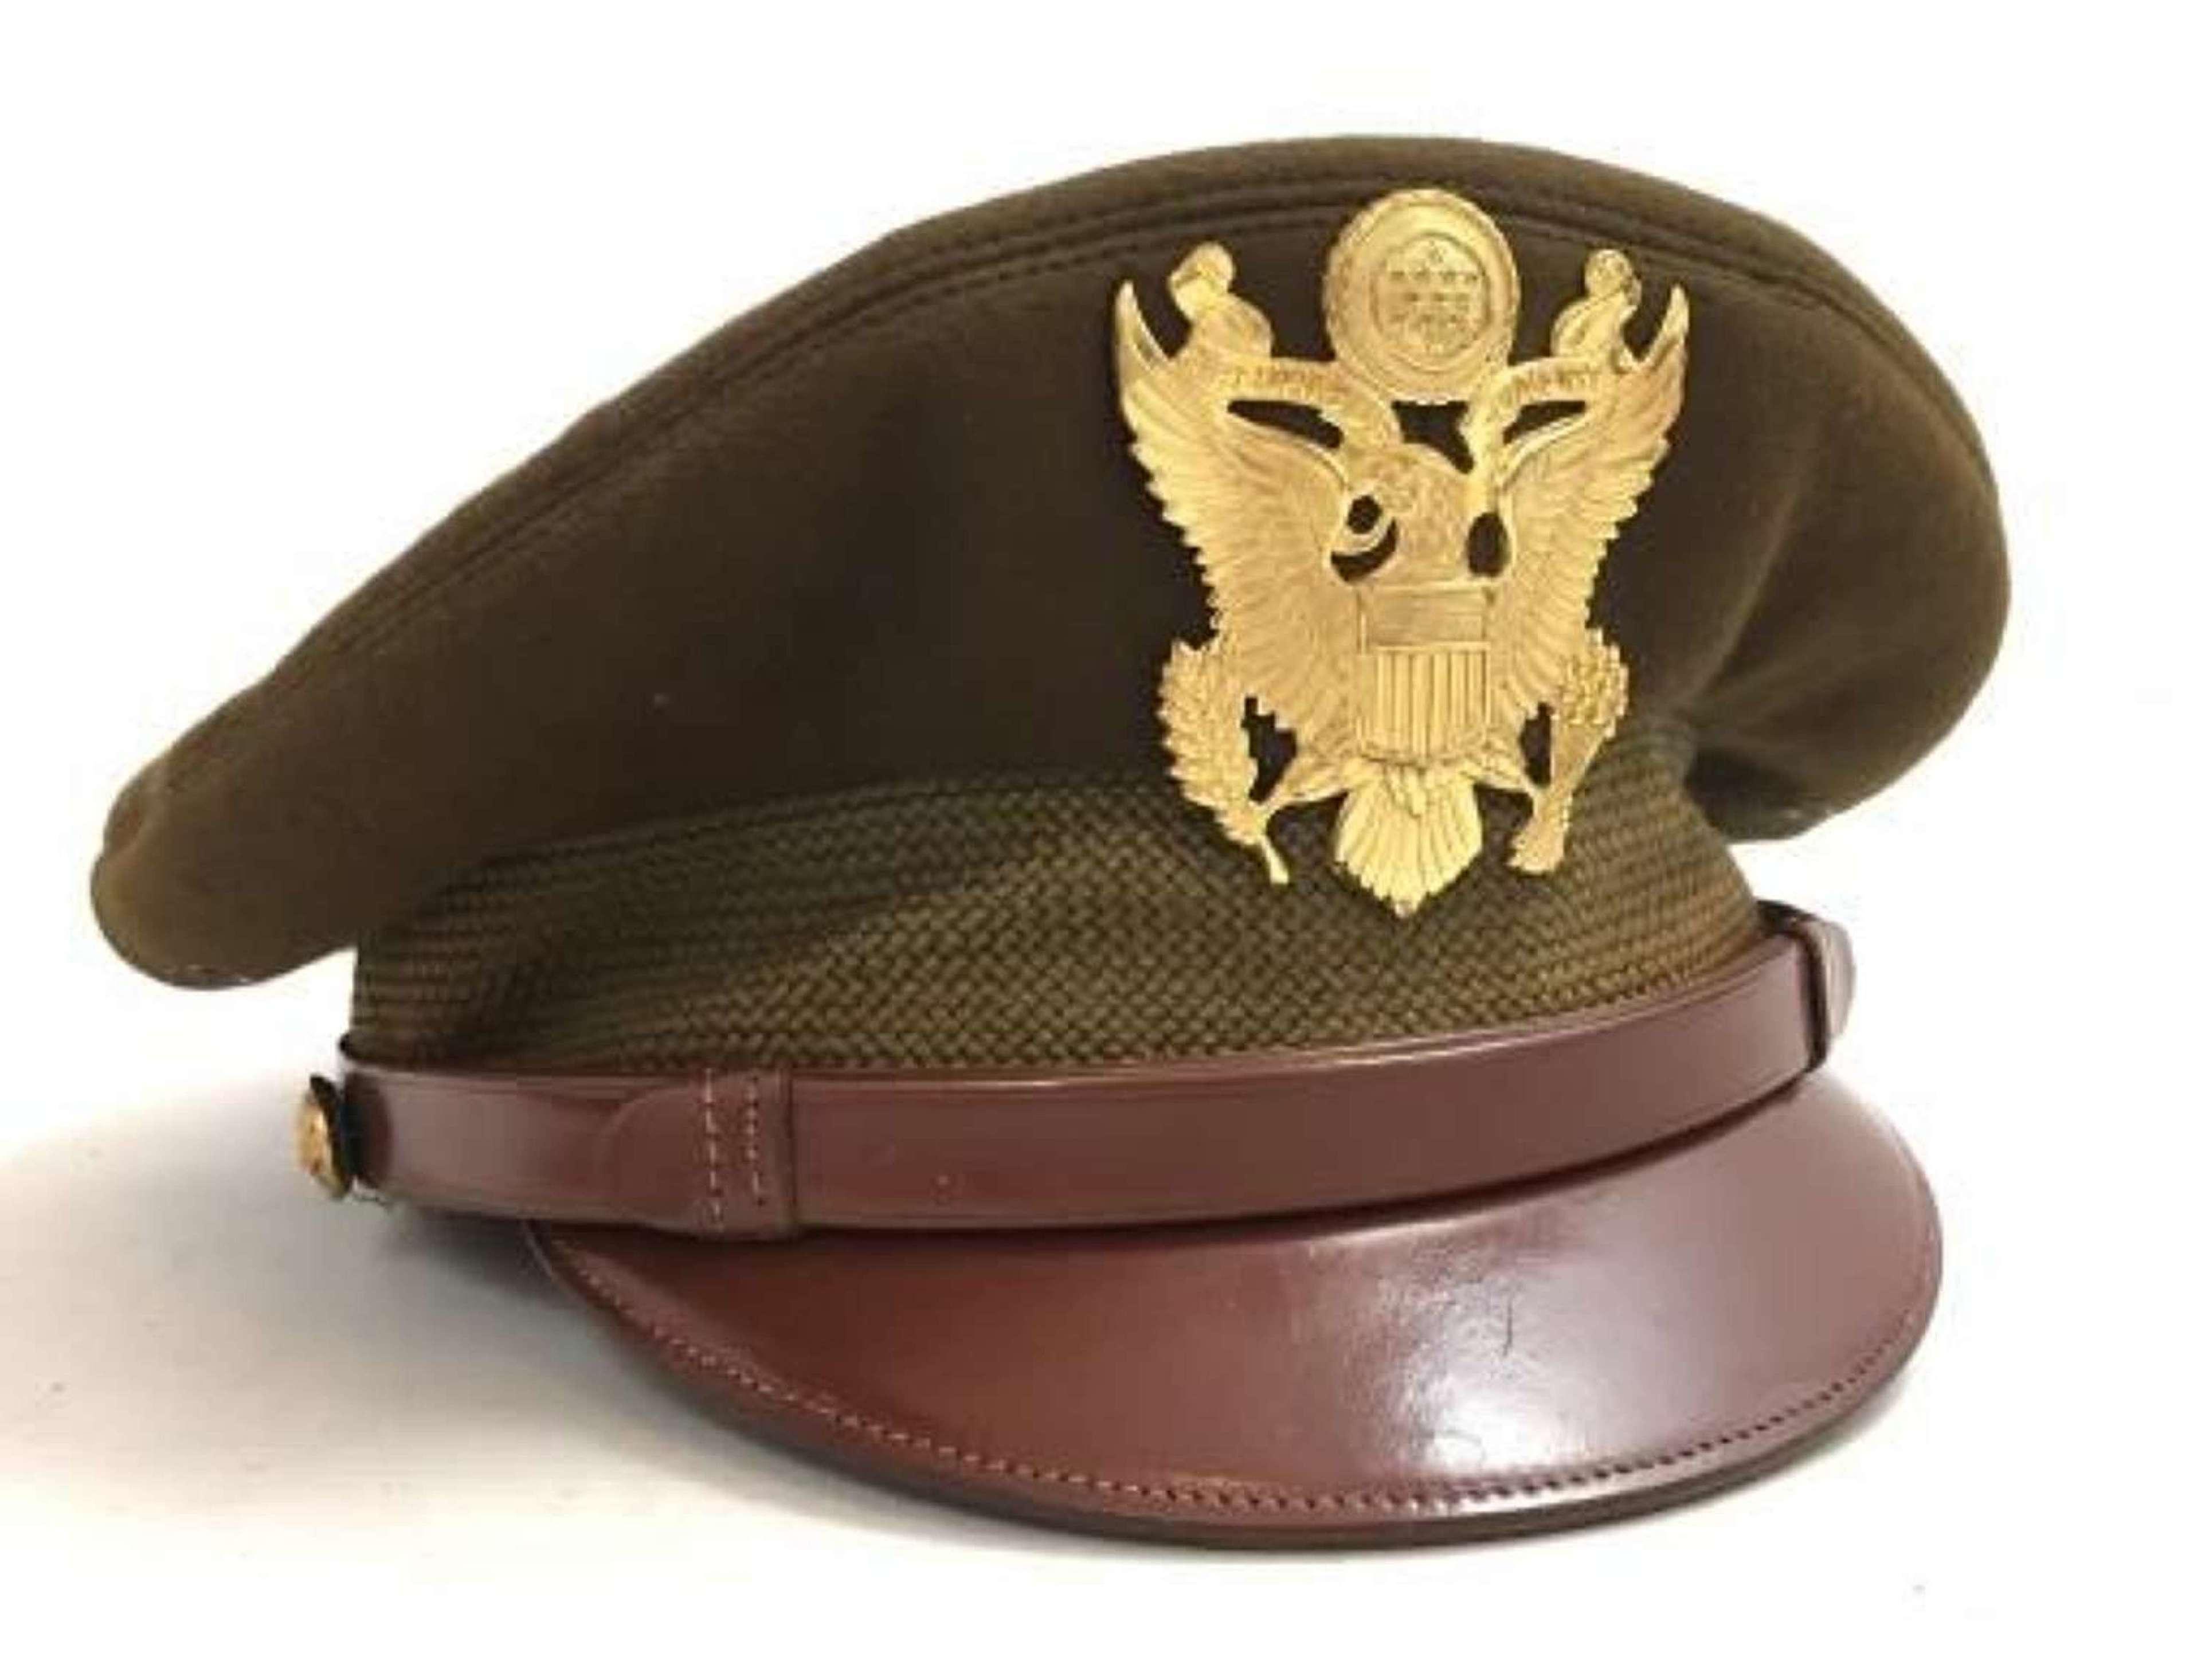 Original WW US Army Officers Service Cap by 'Superior Uniform Cap Co'